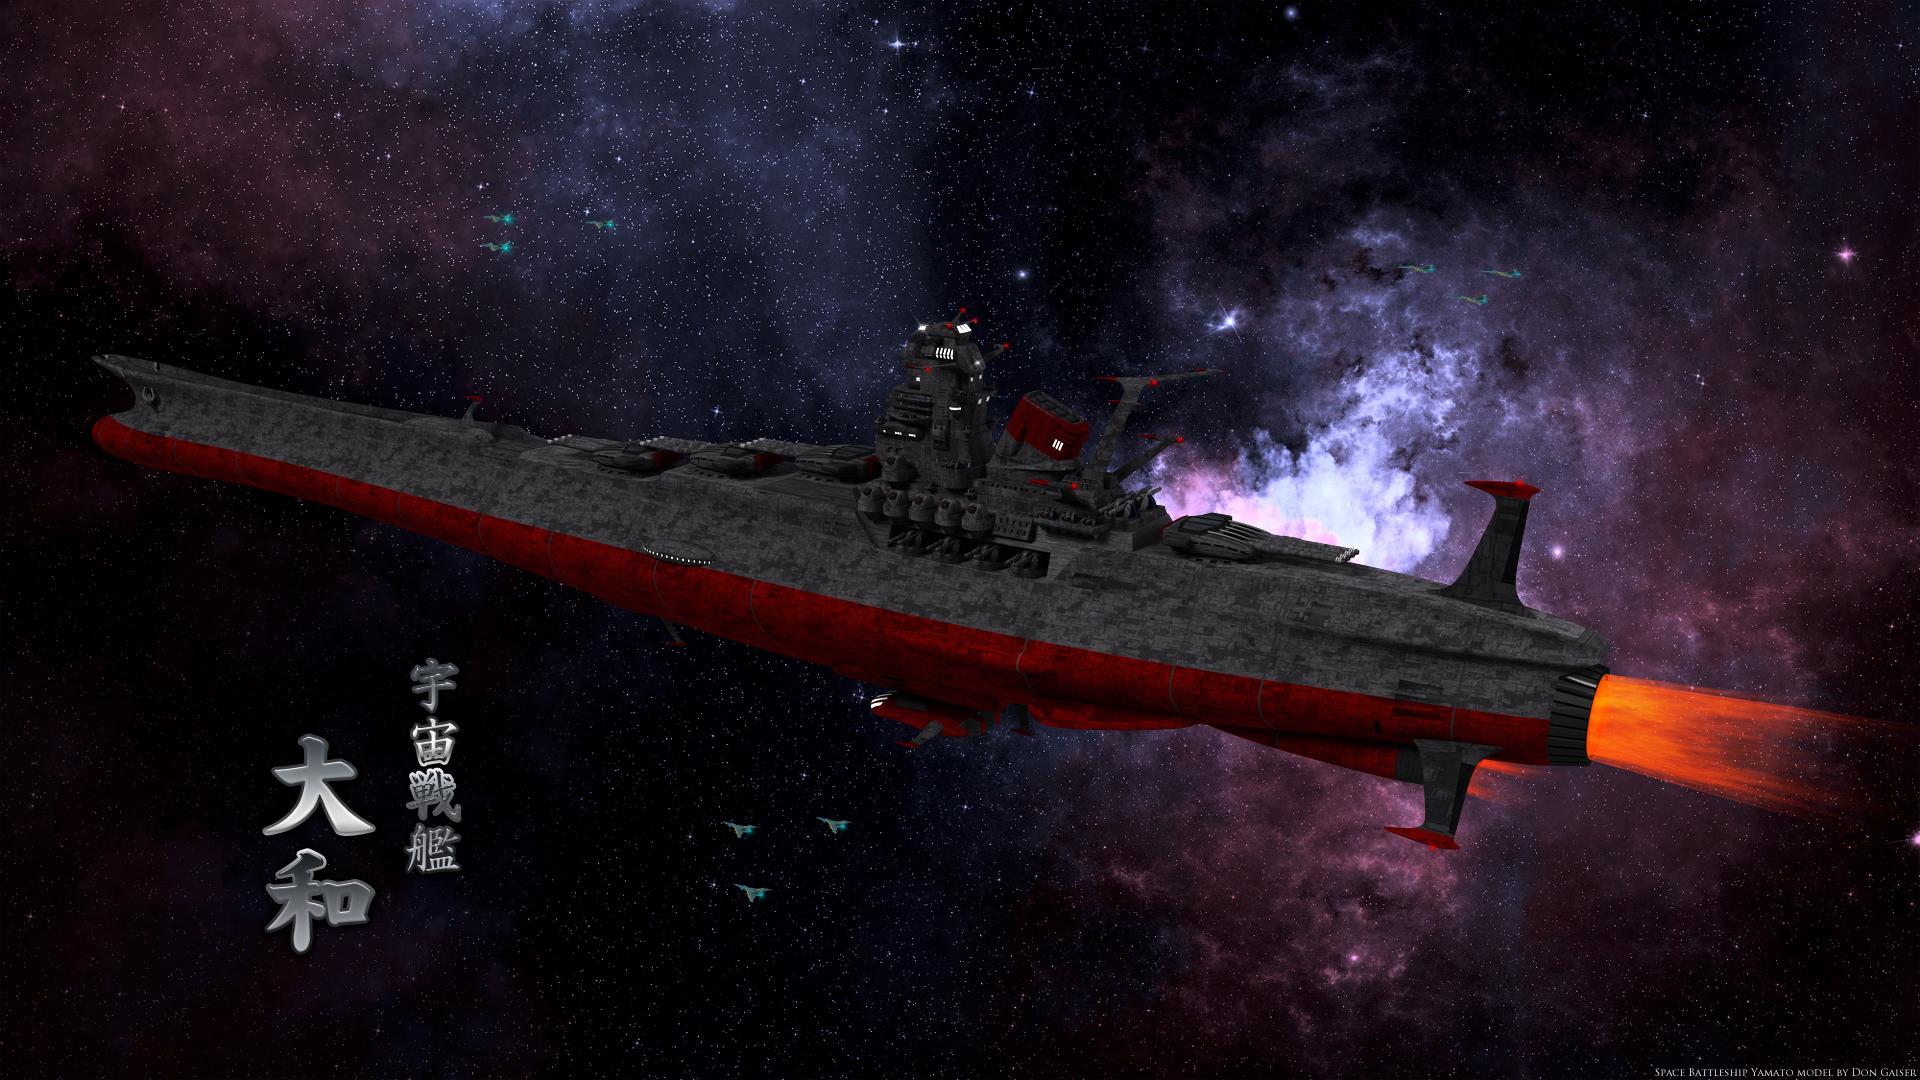 Free Download Space War Ship Space Ship Lego Star Wars Ship